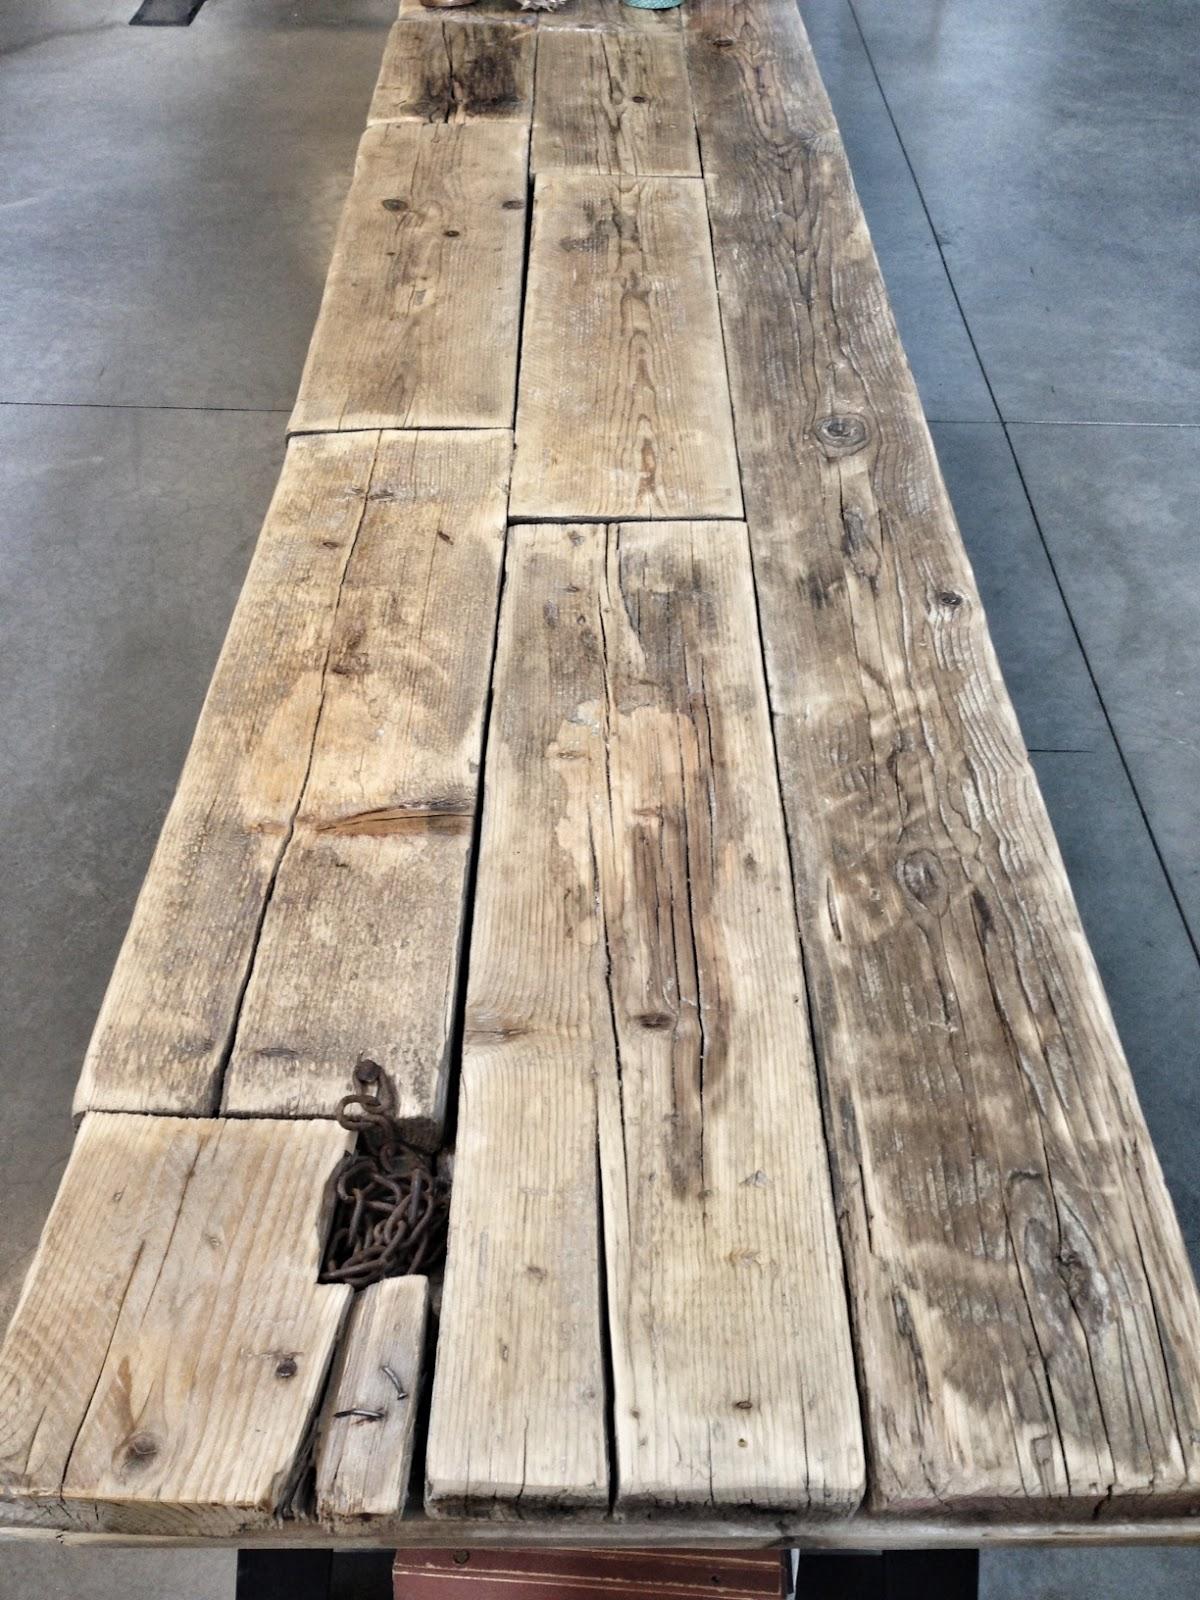 Hunters wood tavolo tetris - Tavole da muratore usate ...